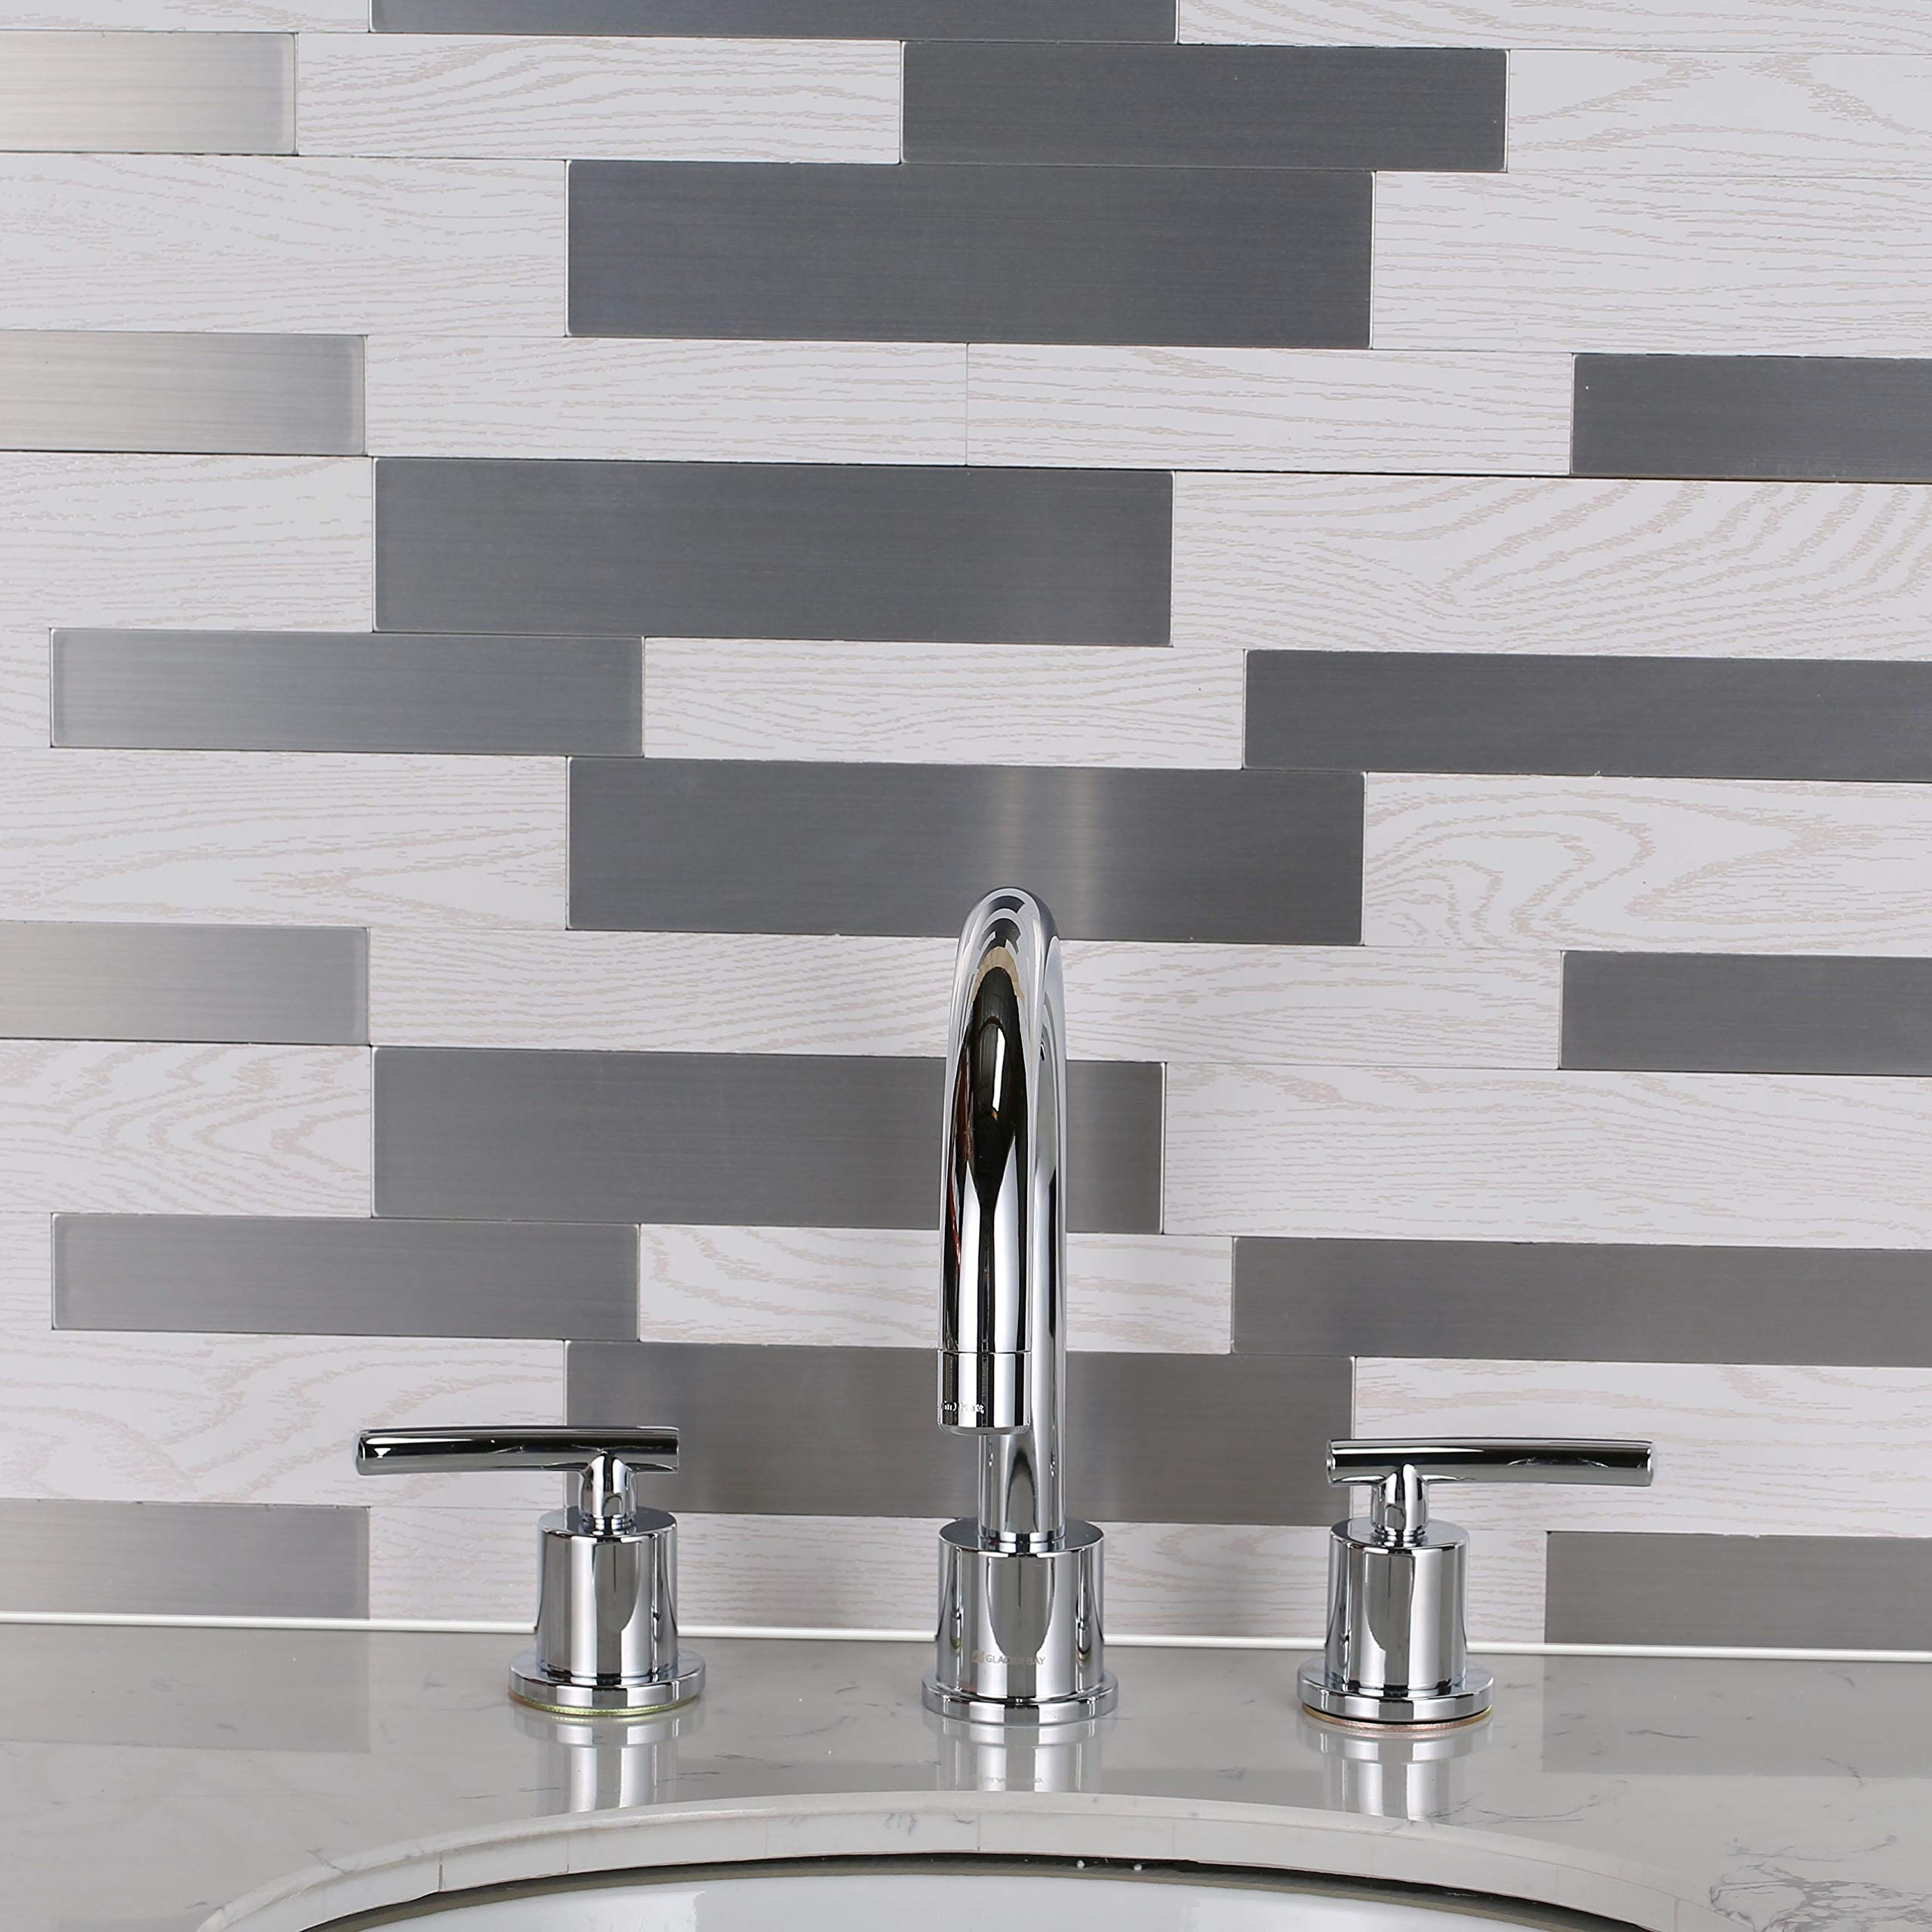 Belmont Home BH SimpliTILE 6 x 24 Peel & Stick Mosaic Tile (Pack of 10) Reclaimed Wood, Silver Metal